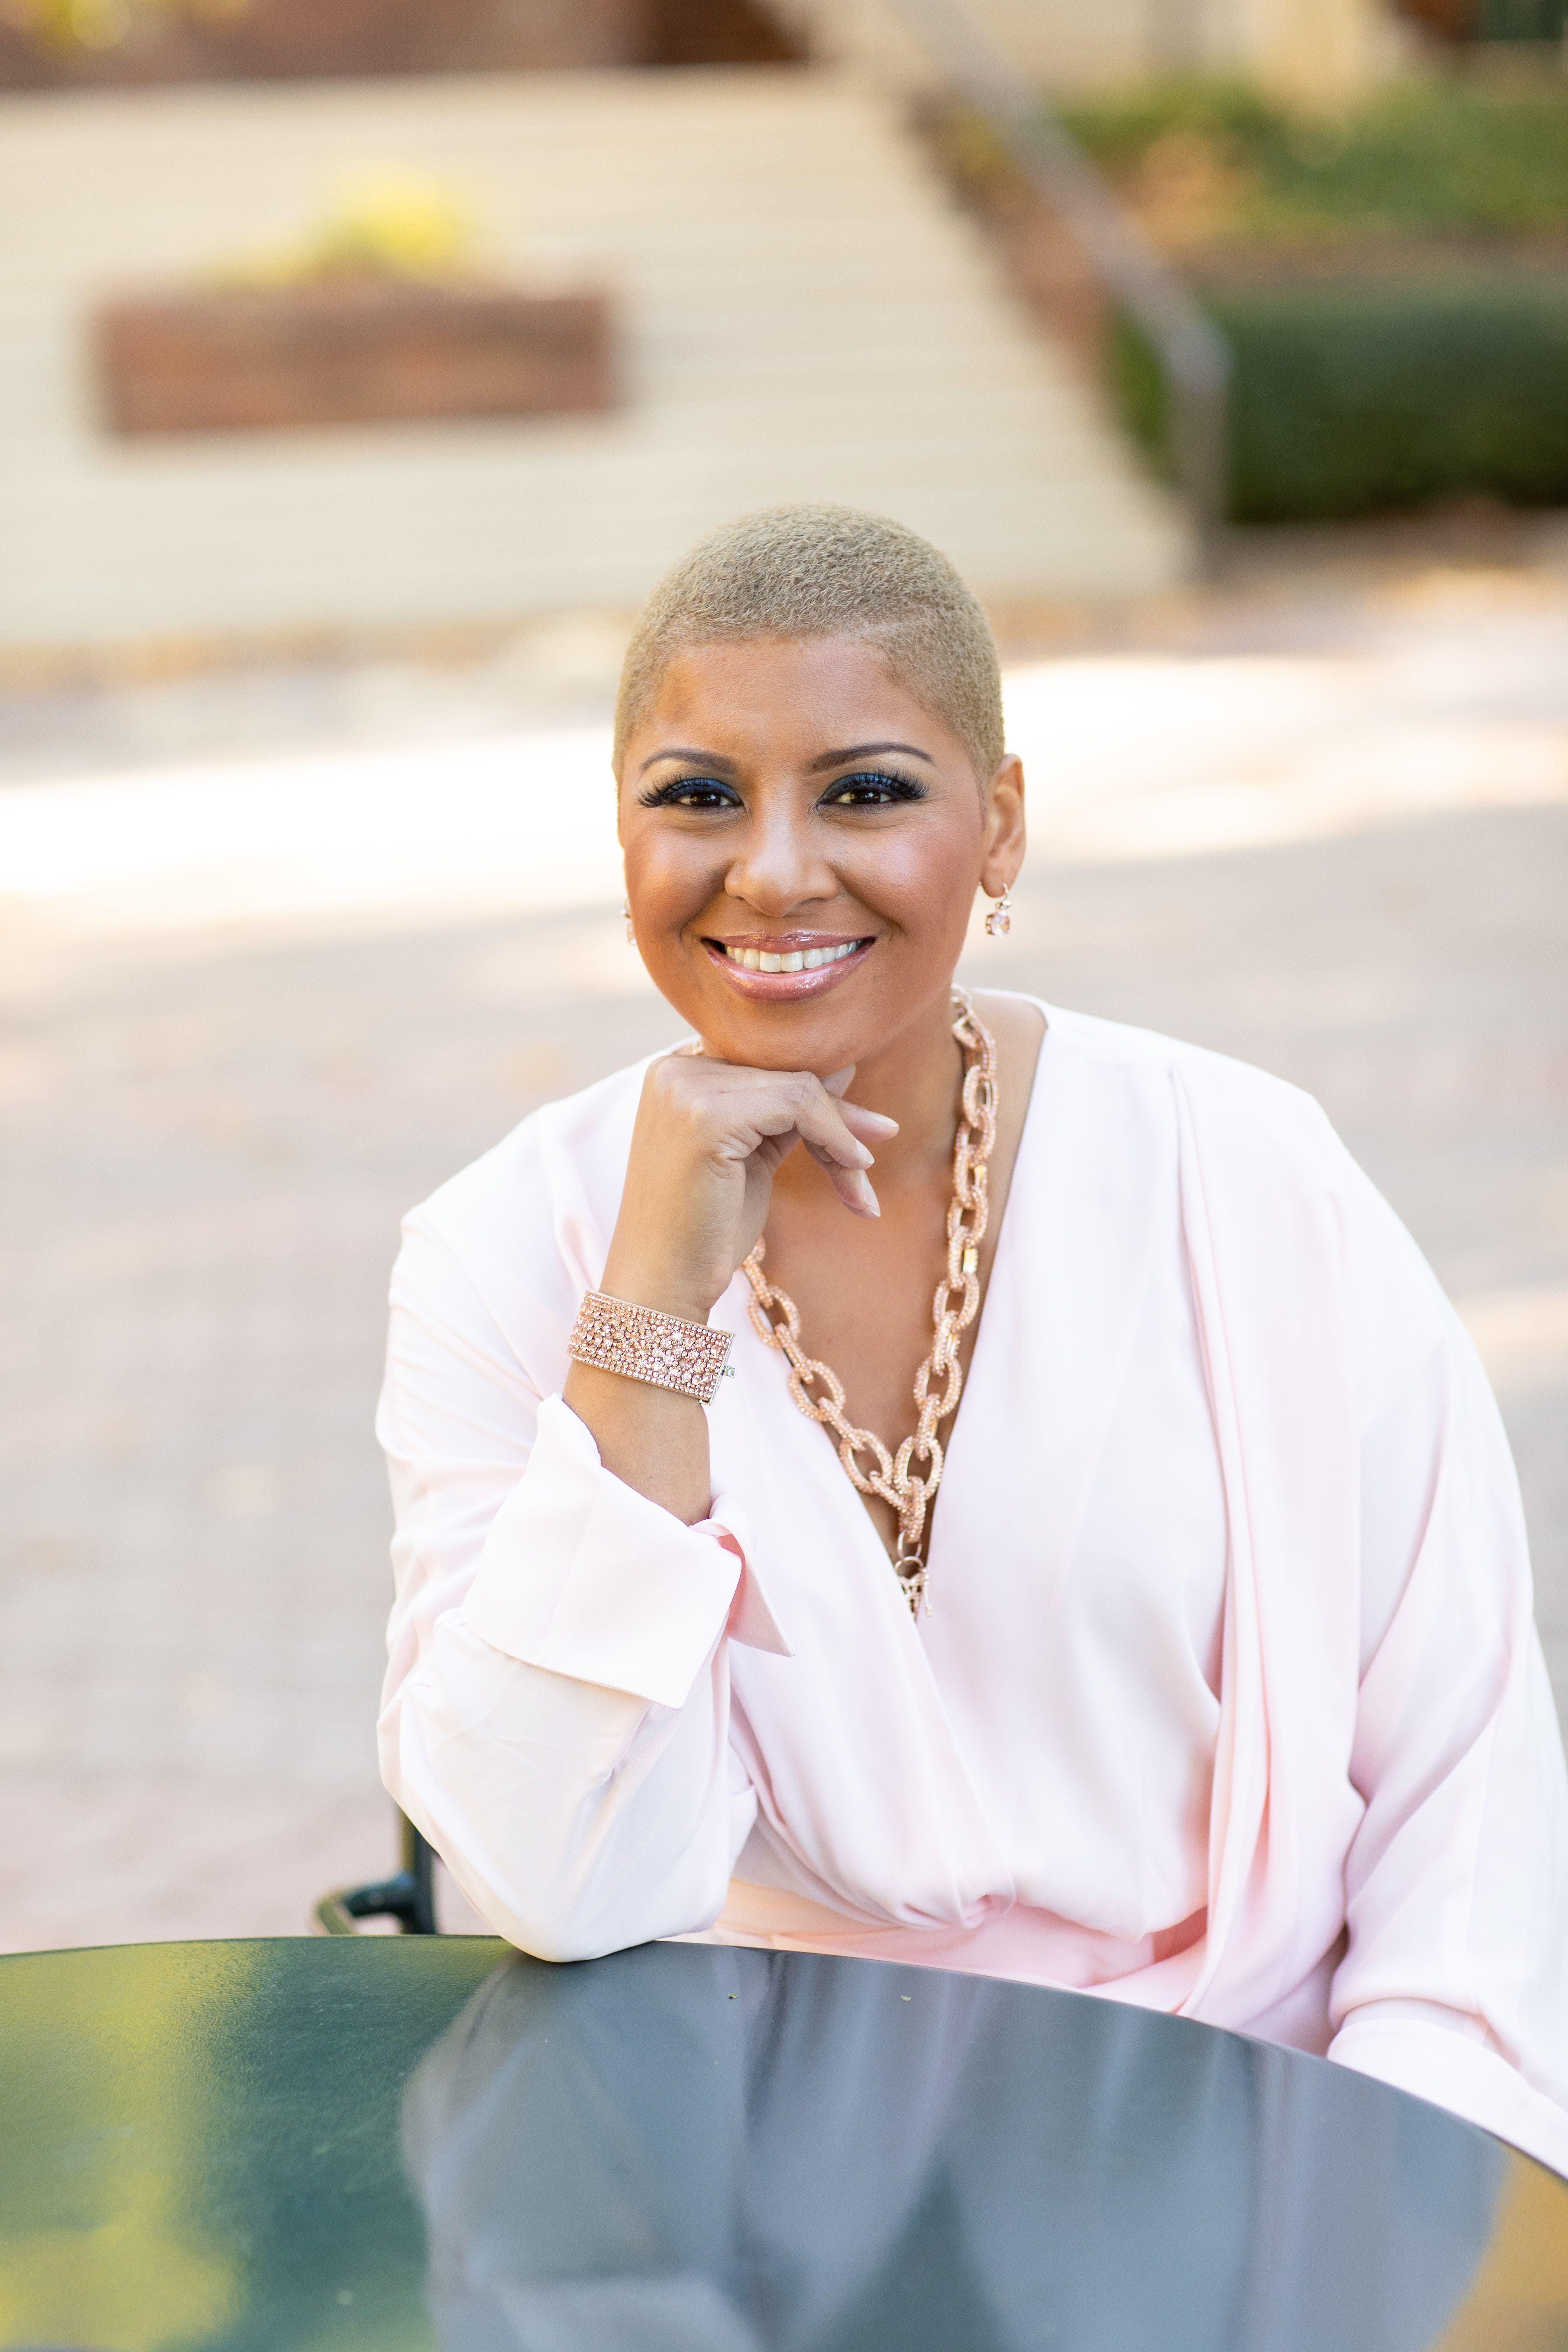 Black History Month 2021 Psychiatrist Spotlight: Dr. Ericka Goodwin